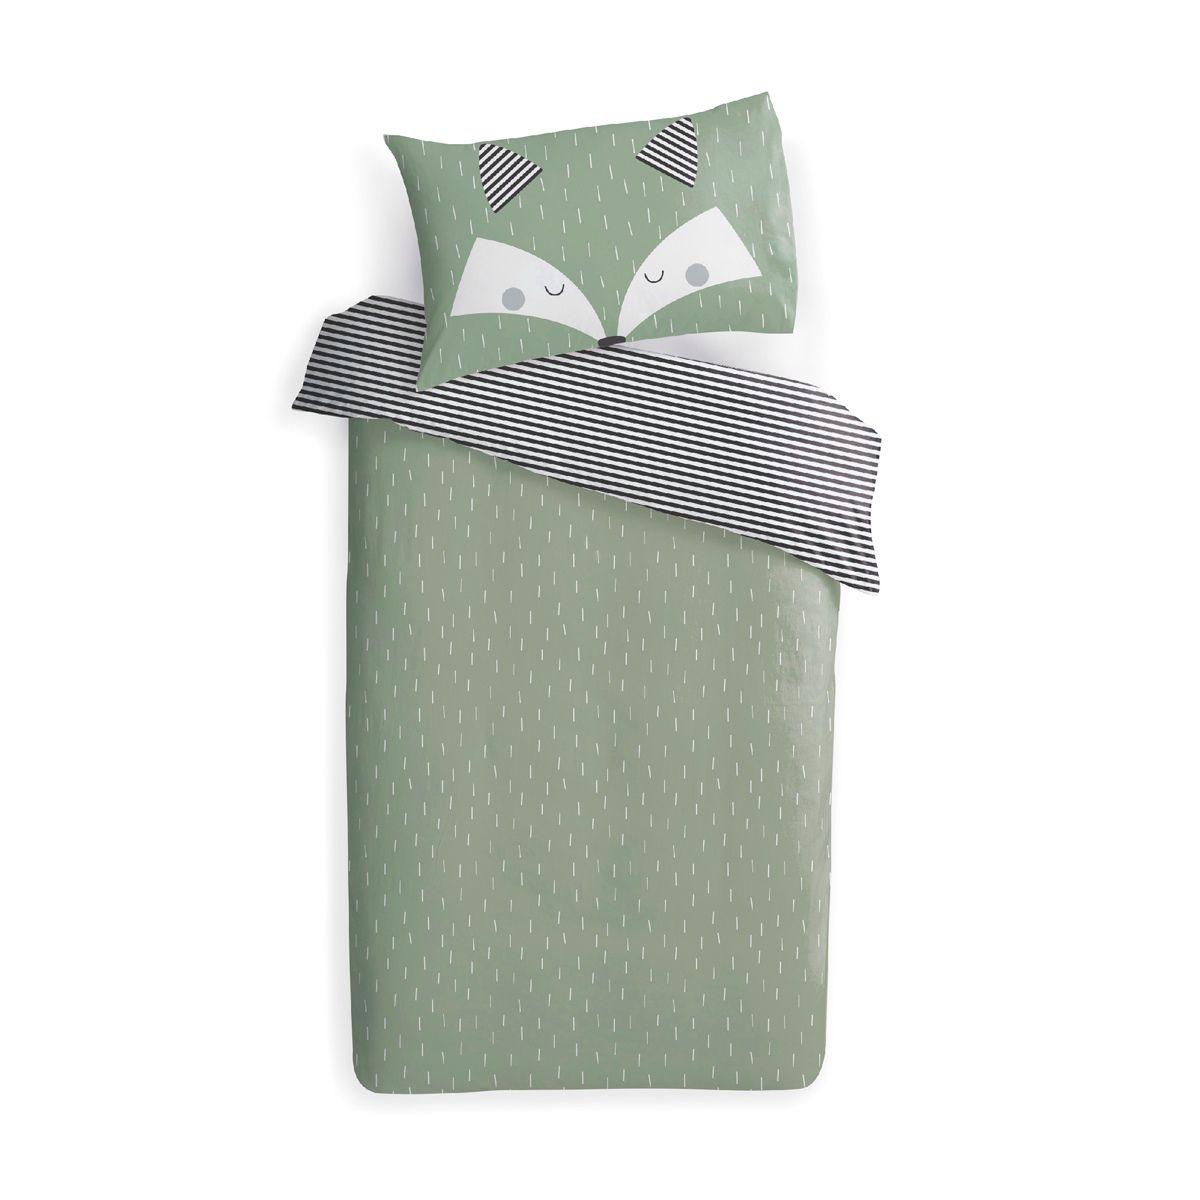 Fox Comforter Set Single Bed Kmart Comforter Sets Single